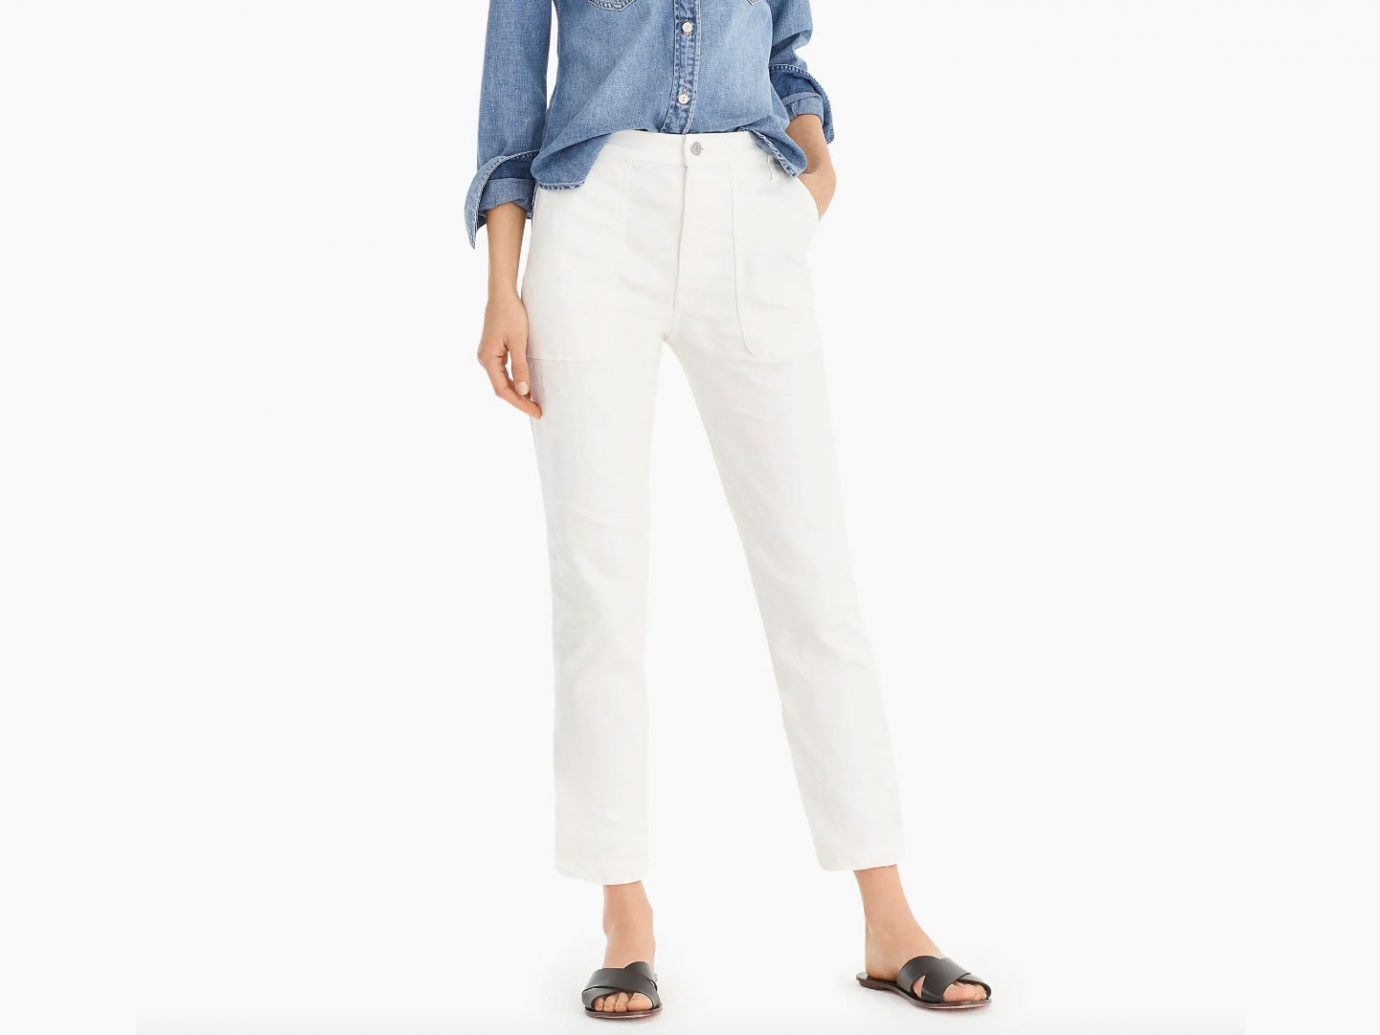 J.Crew Straight-Leg Crop Jean in Garment-Dyed Denim